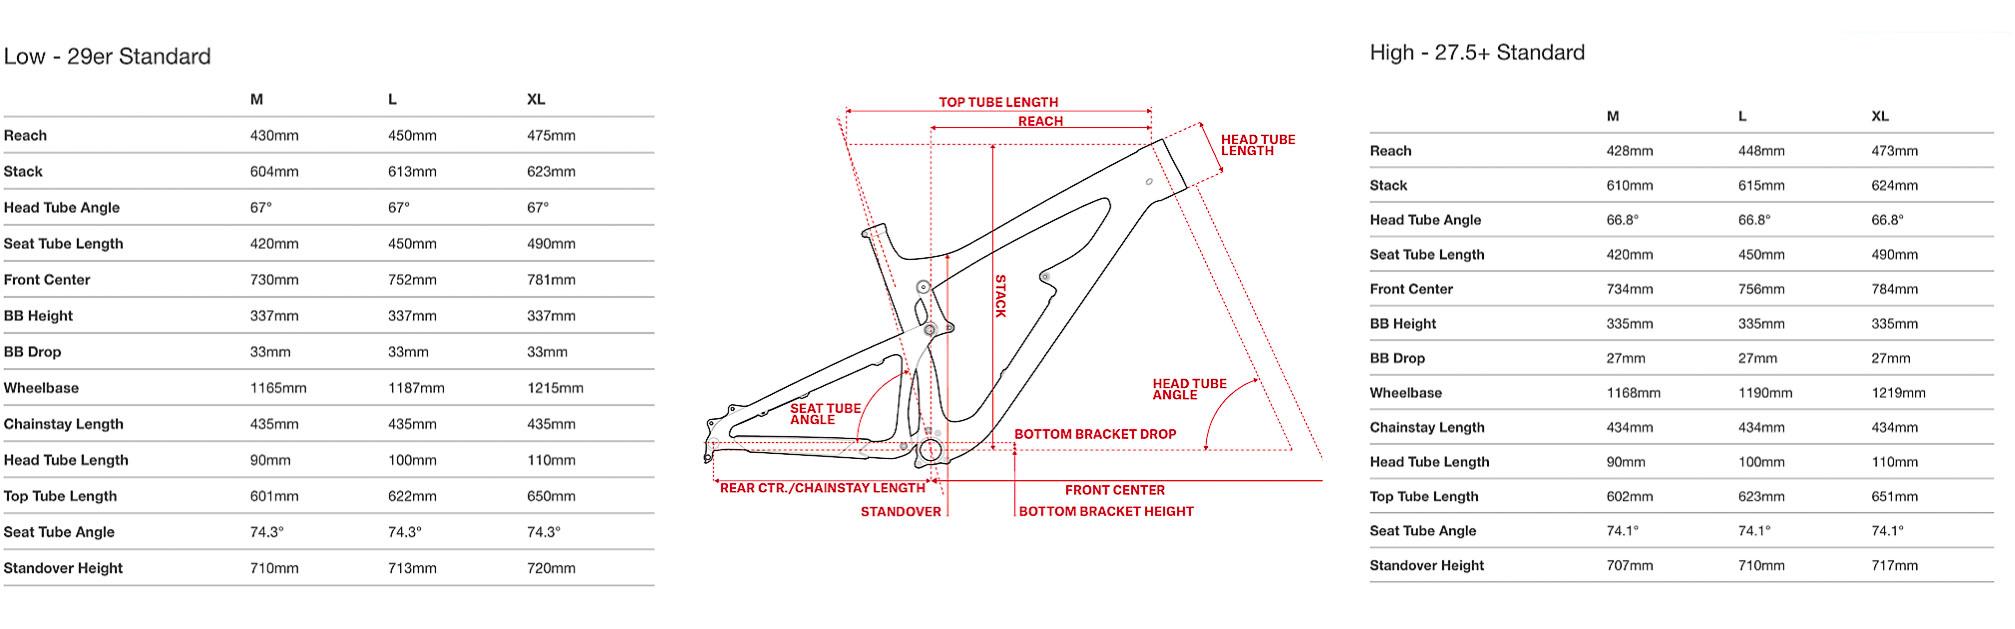 Santa_Cruz_Hightower_Geometry